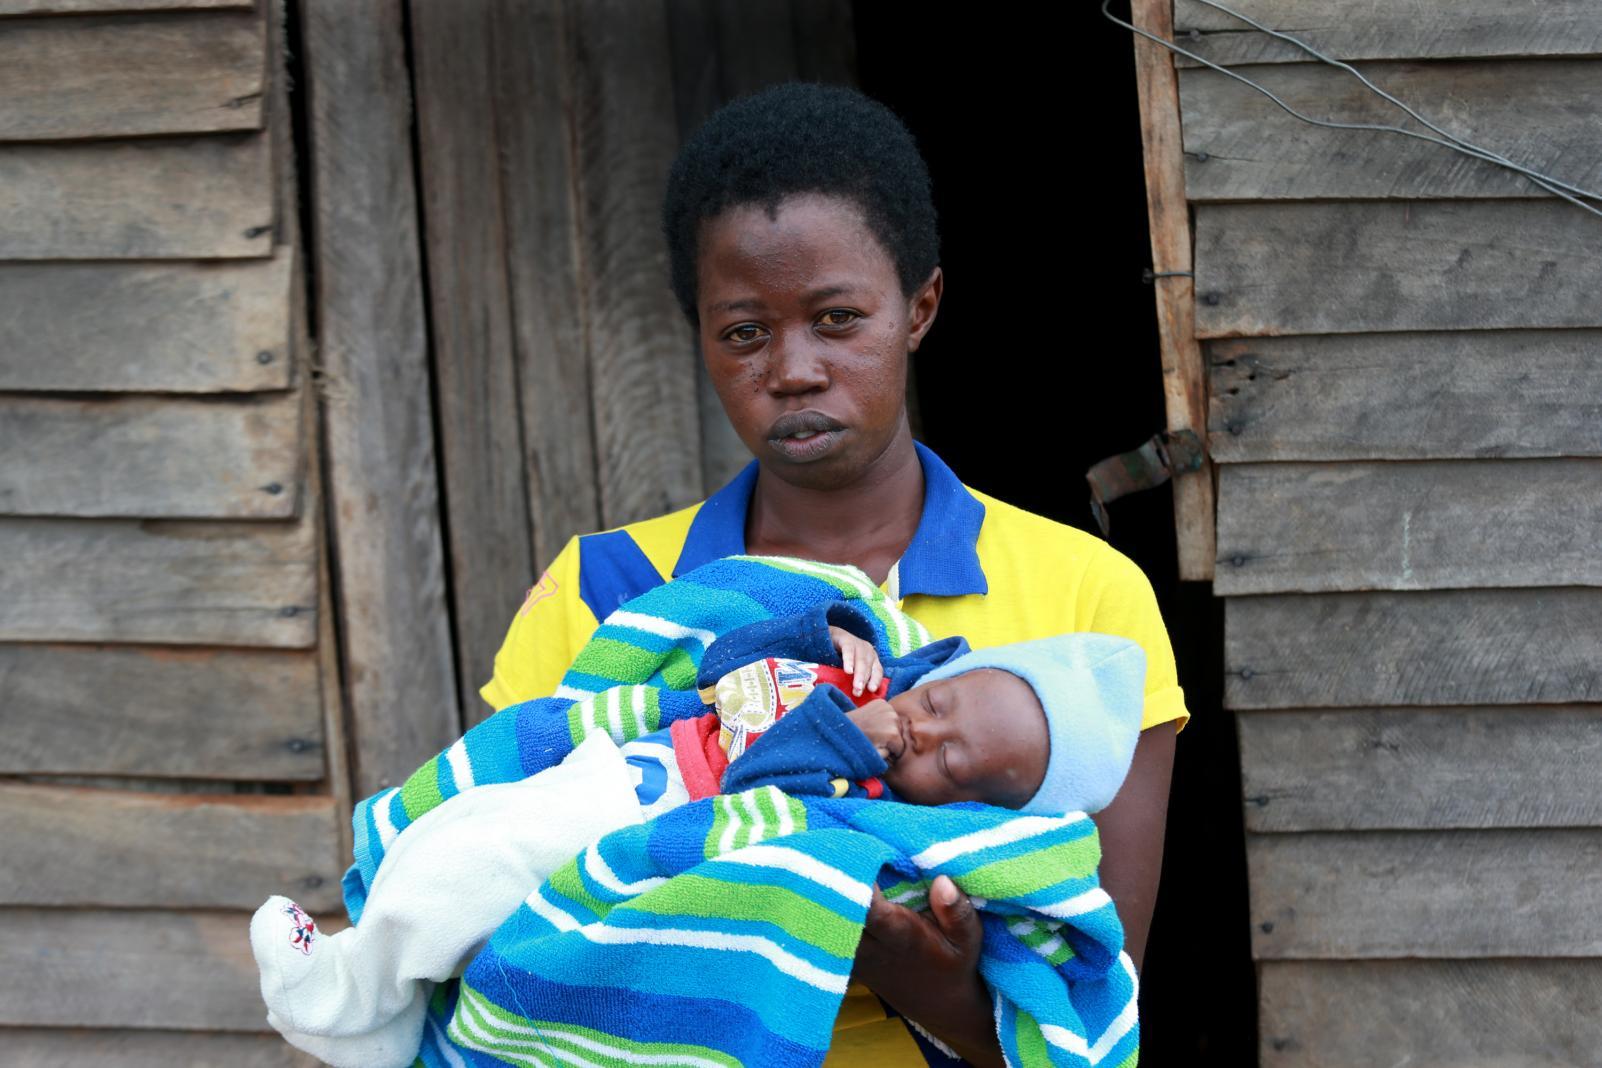 UN reports progress in health of women, children and adolescents, warns against reversal